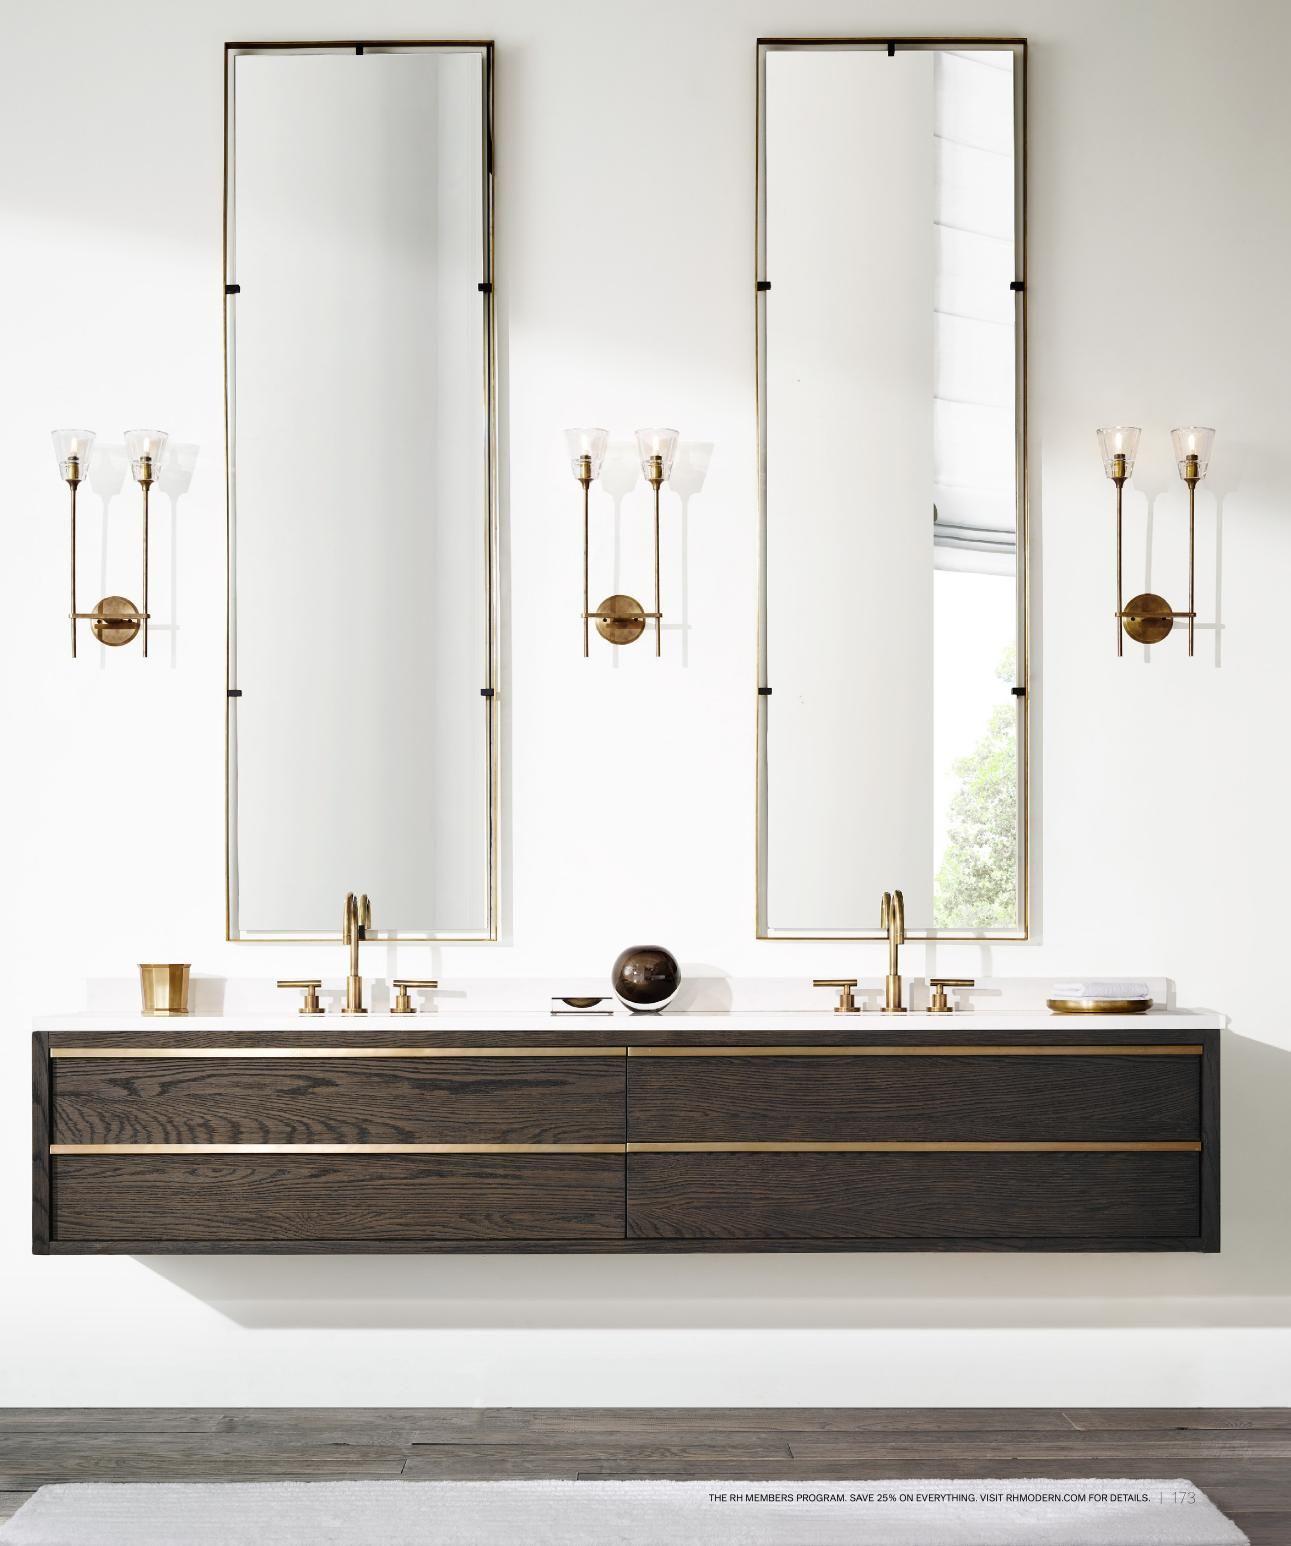 Restoration Hardware What Your Bathroom Can Look Like With Plain White Walls Diy Bathroom Decor Bathroom Interior Luxury Bathroom